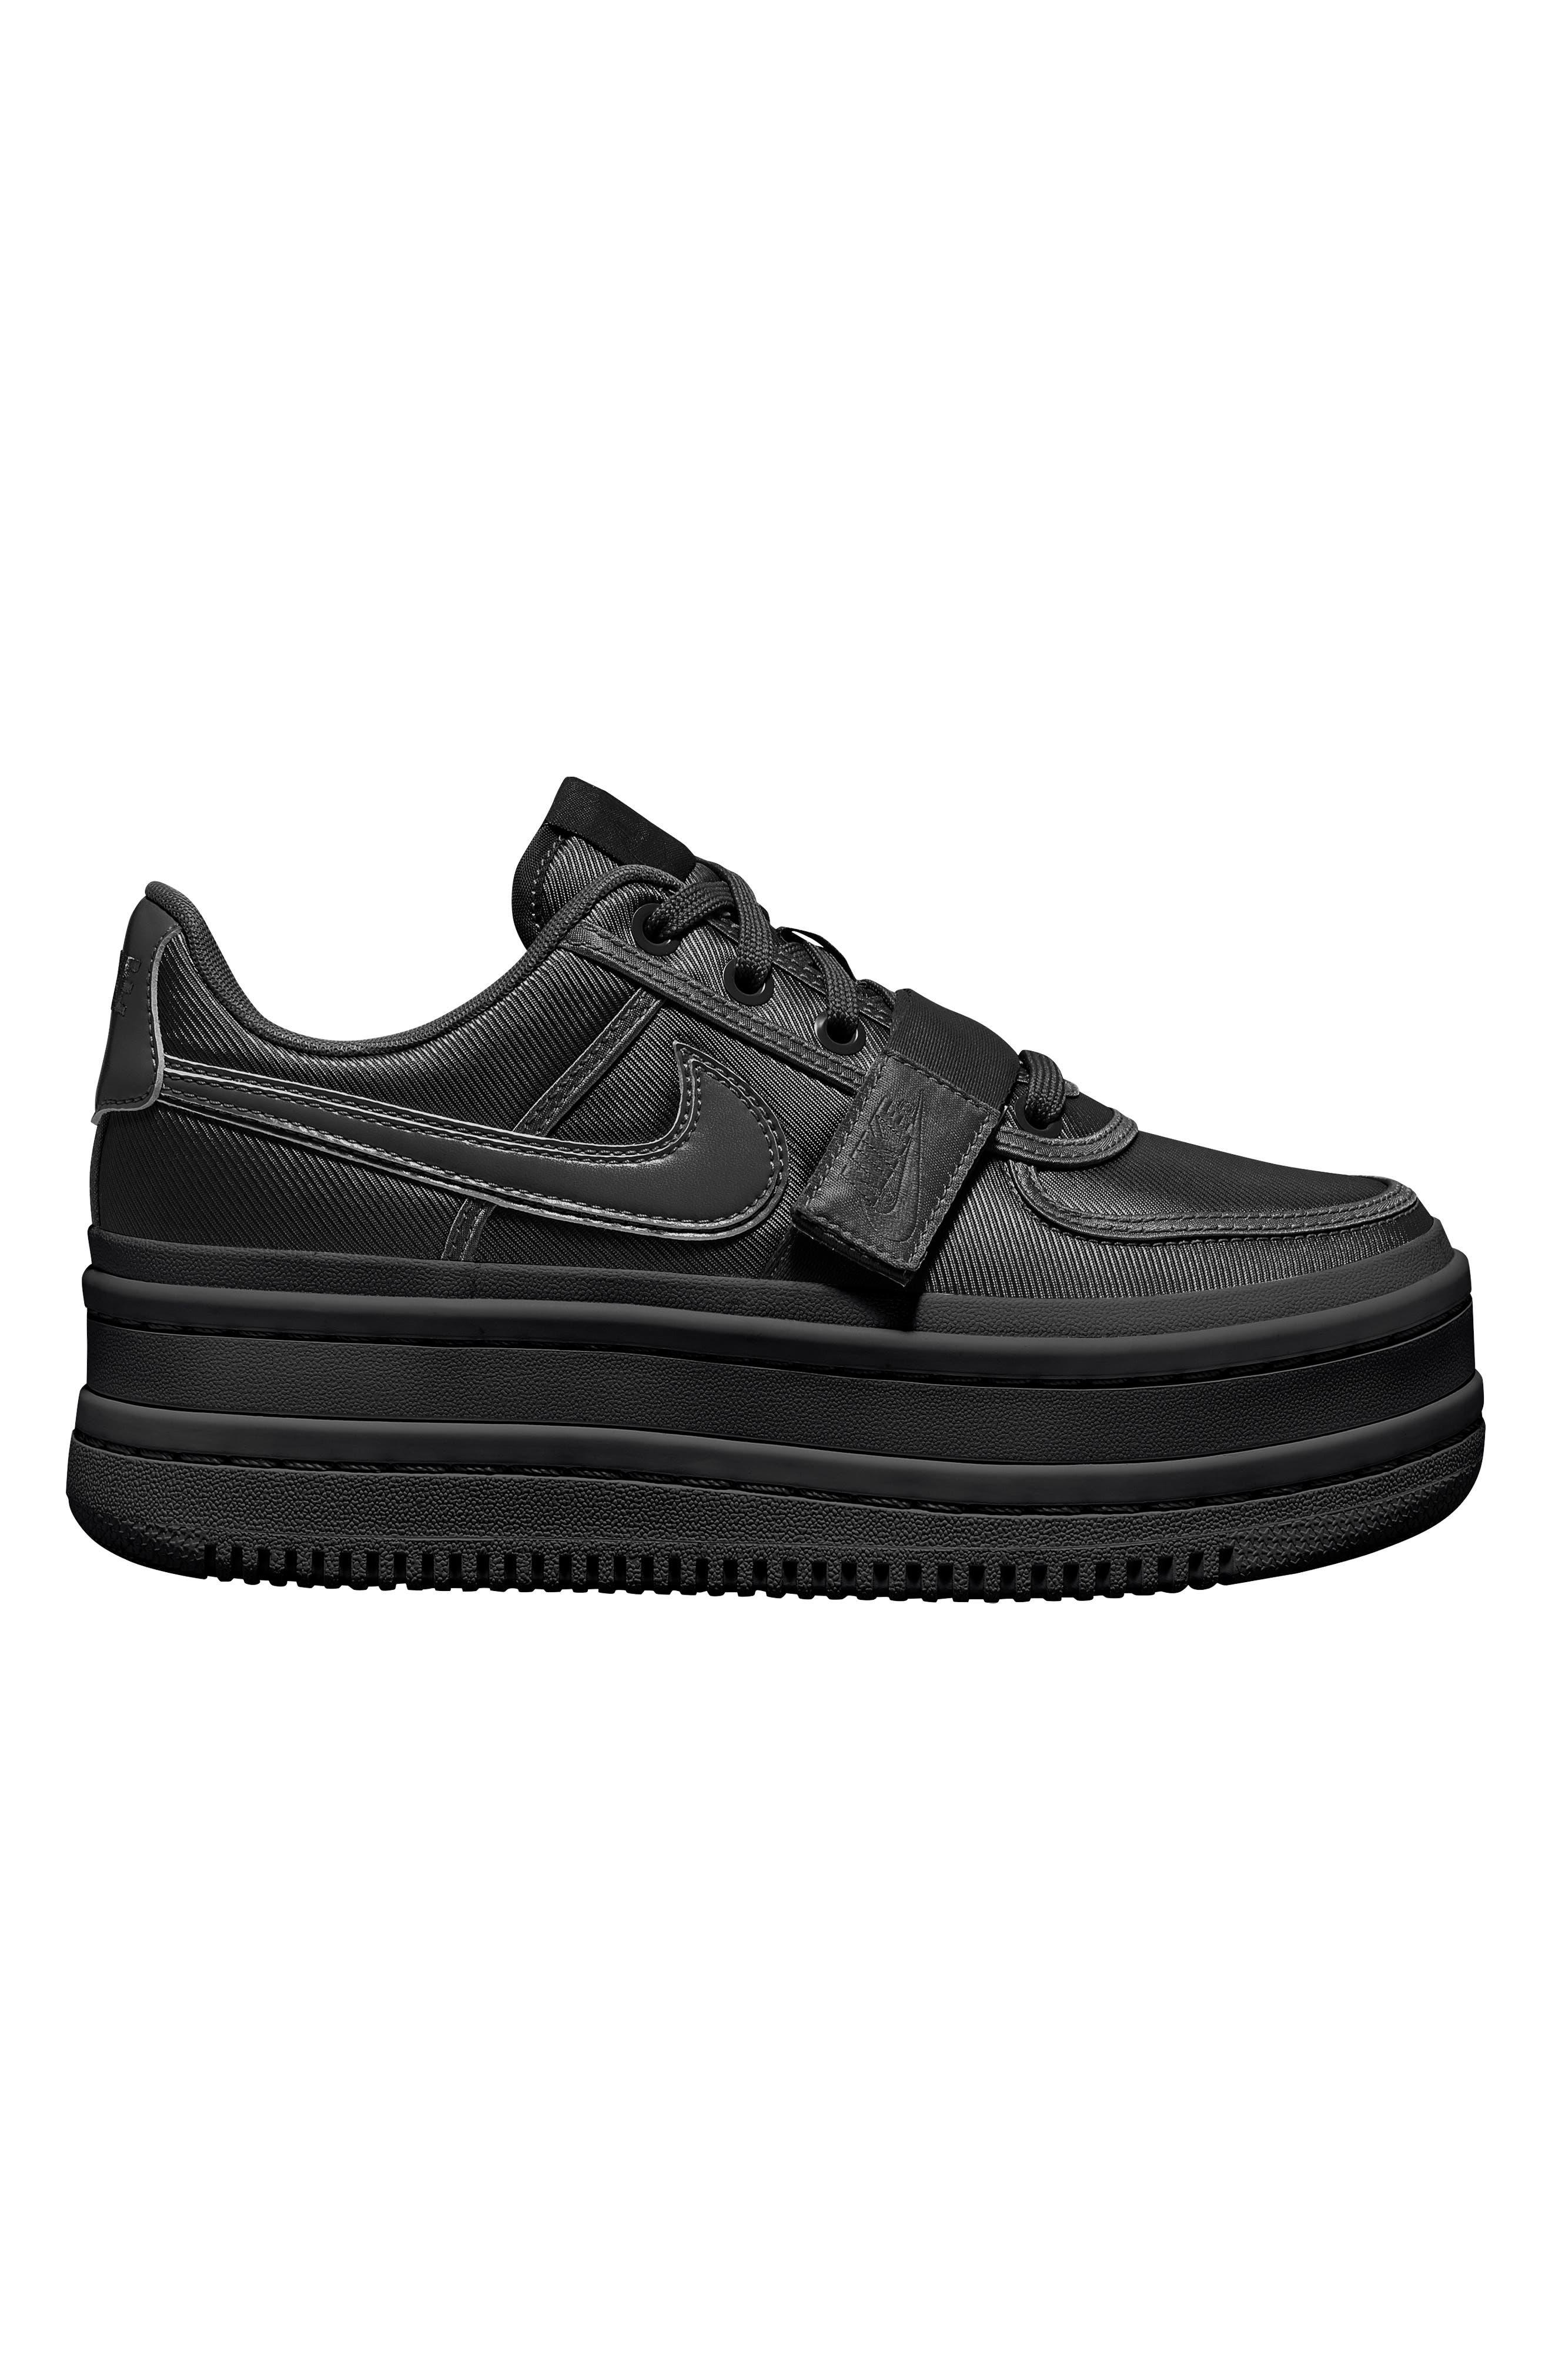 NIKE Vandal 2K Sneaker, Main, color, BLACK/ BLACK